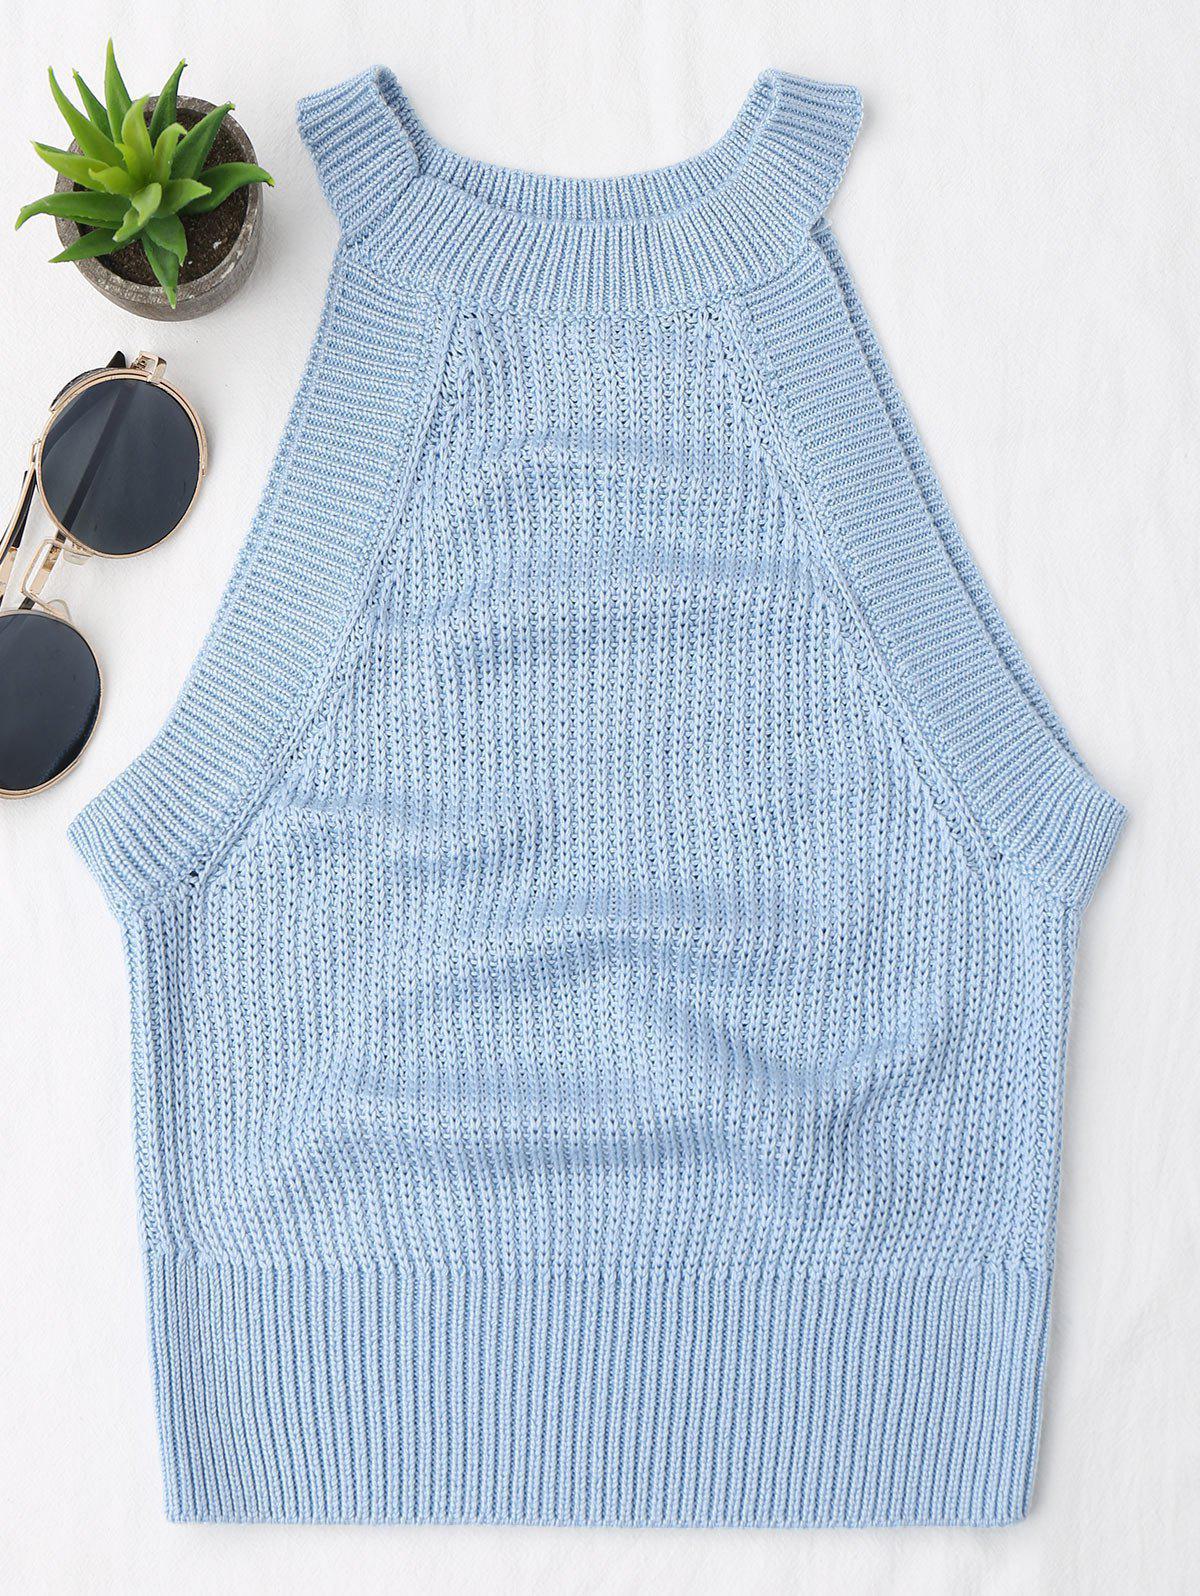 Knitting High Neck Tank Top 215668816